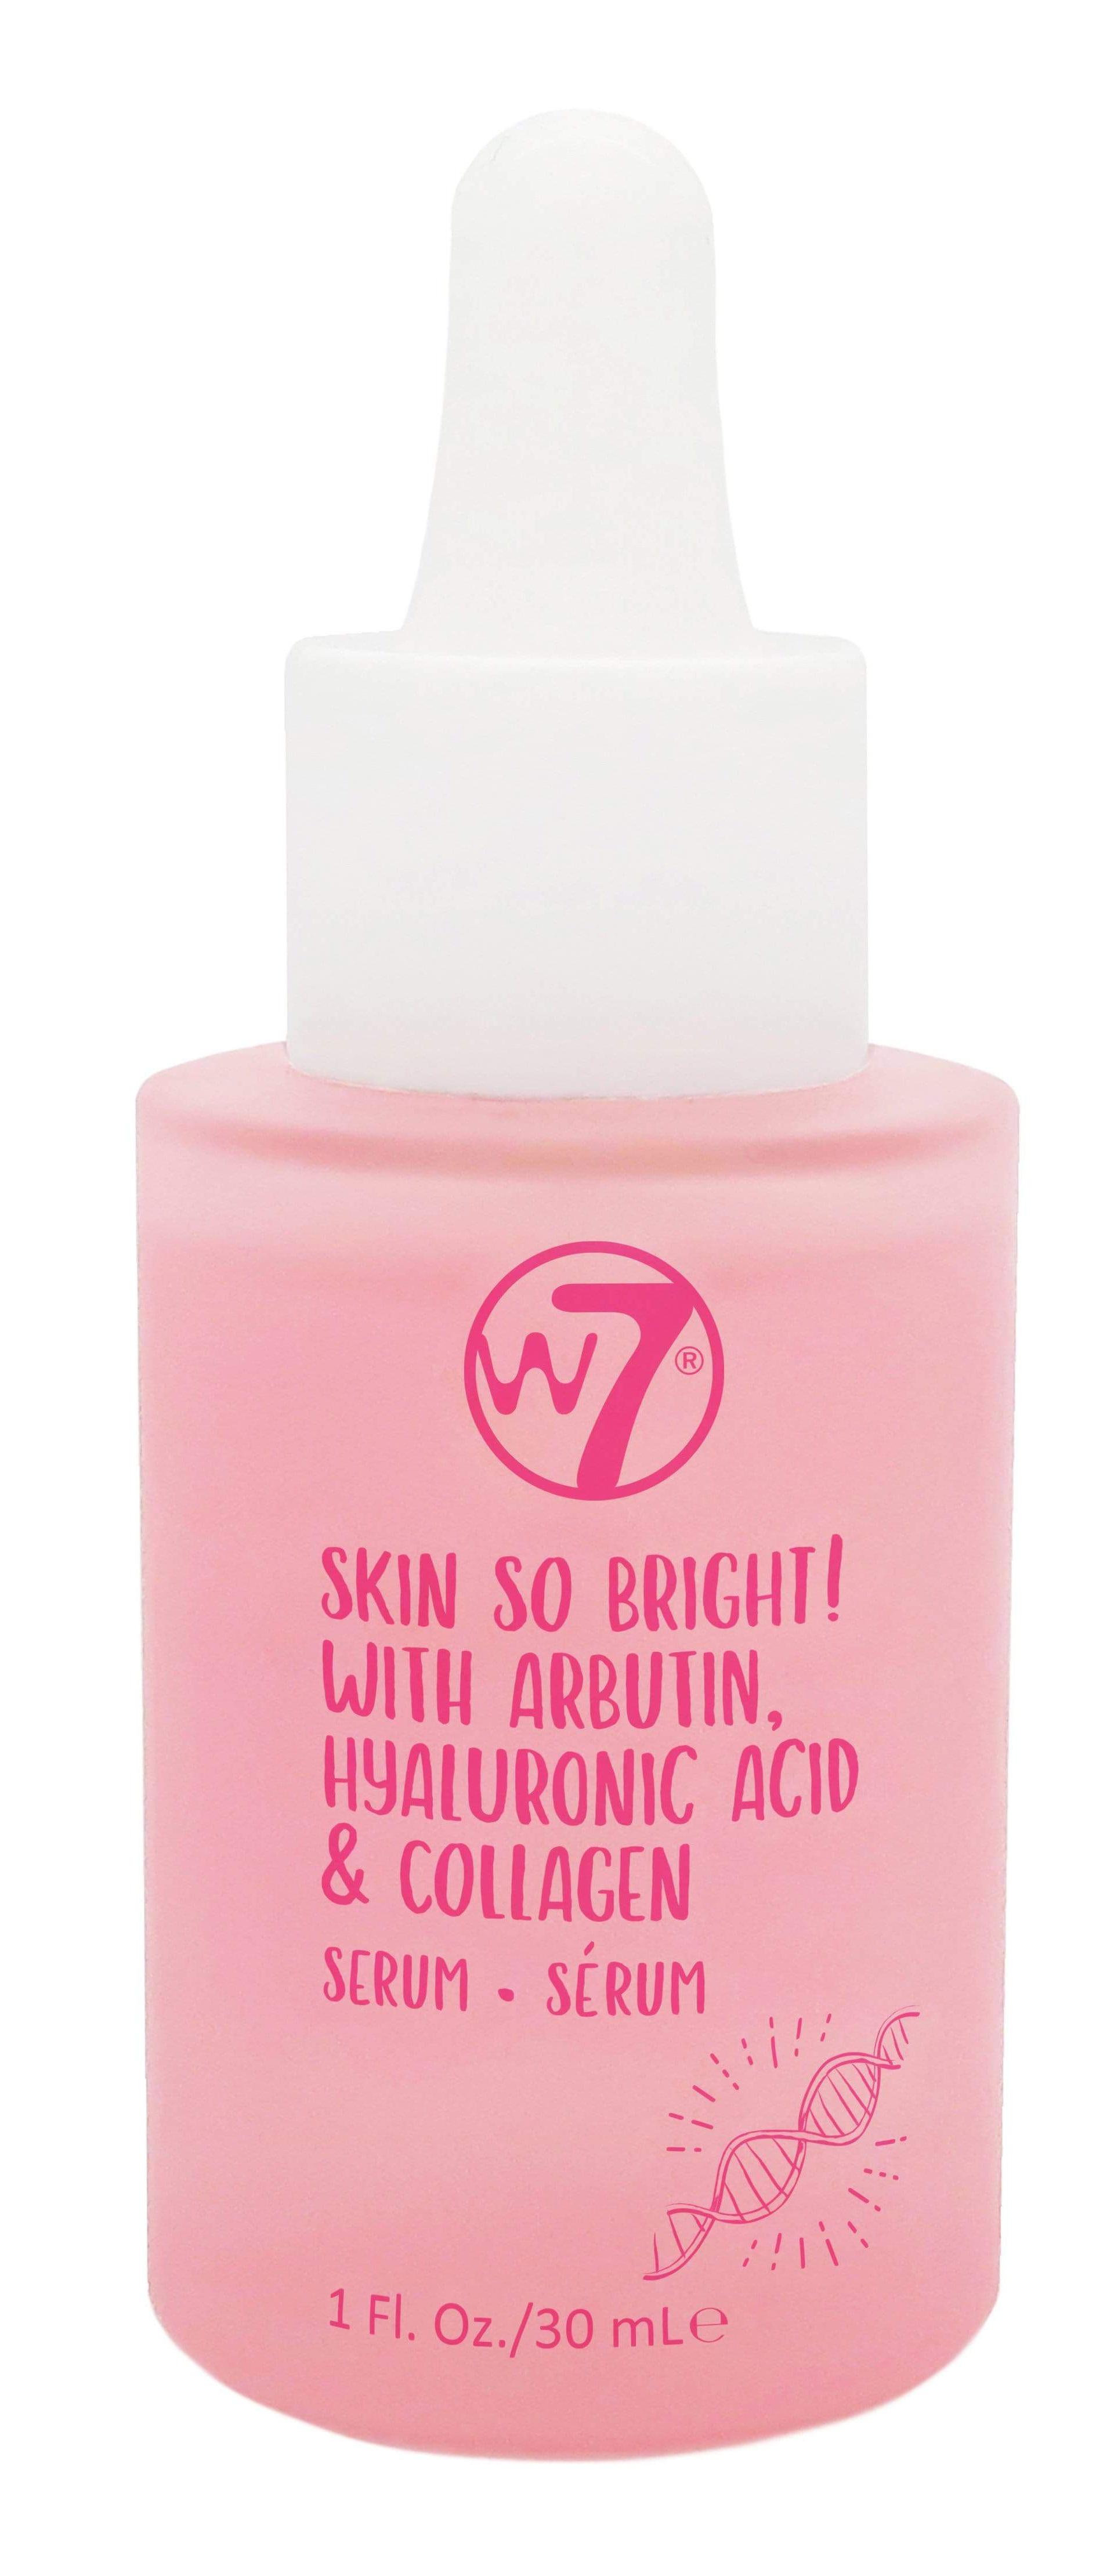 W7 Skin So Bright! Face Serum